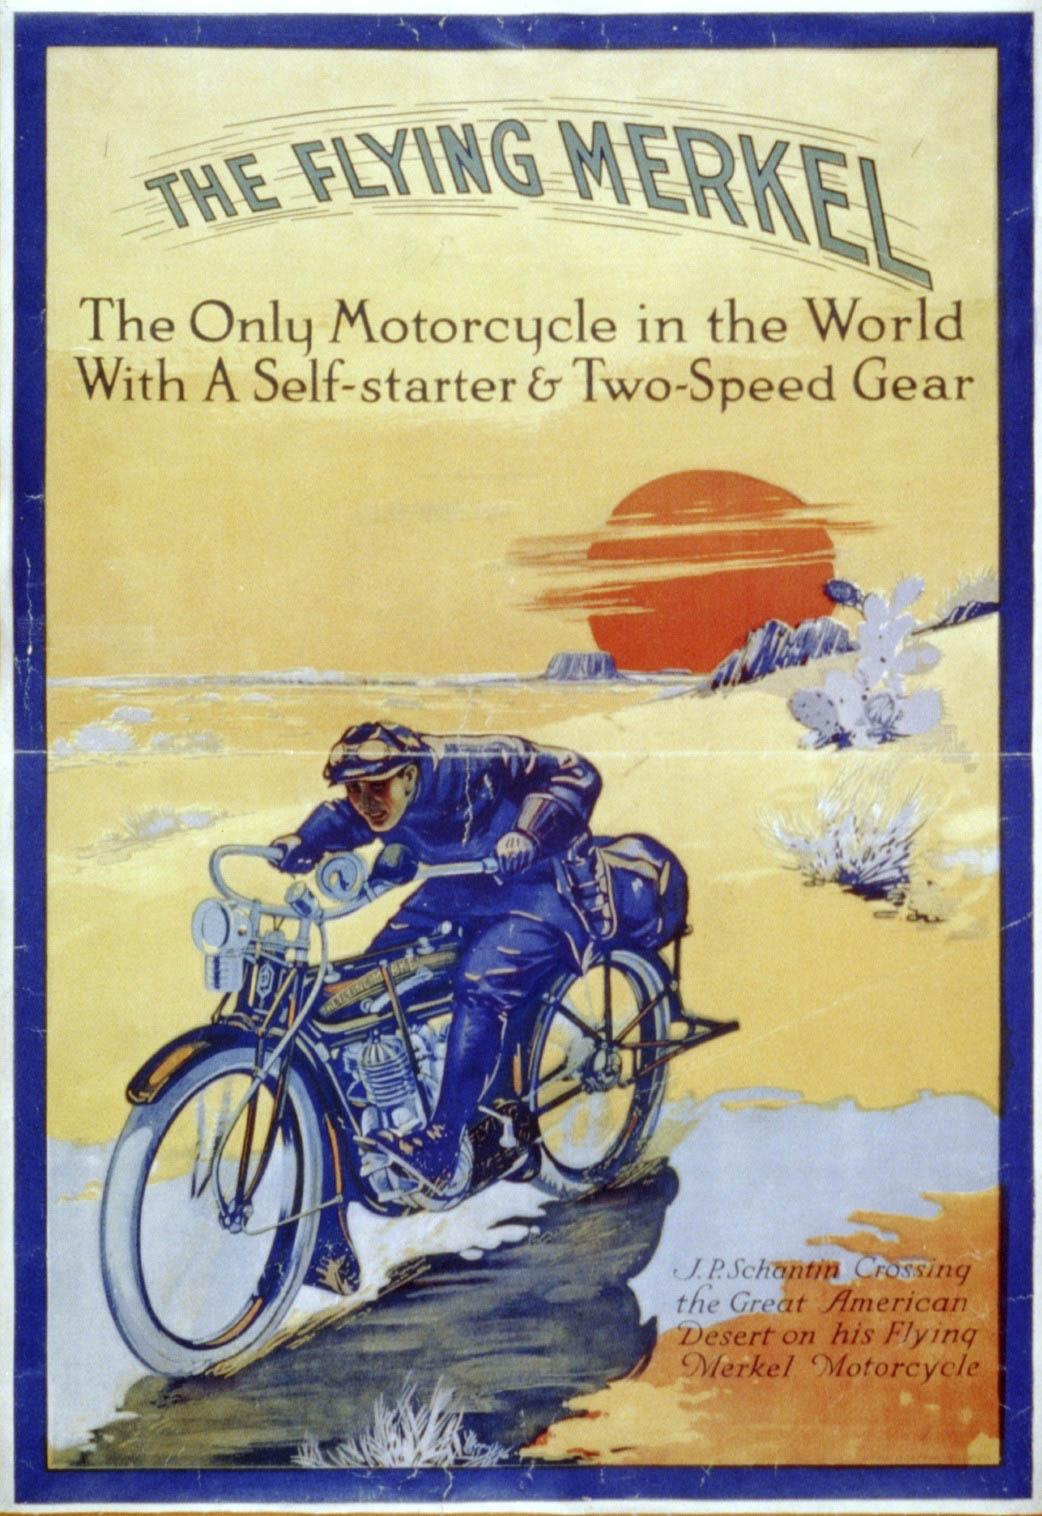 Flying Merkel motorcycle classic advertisement